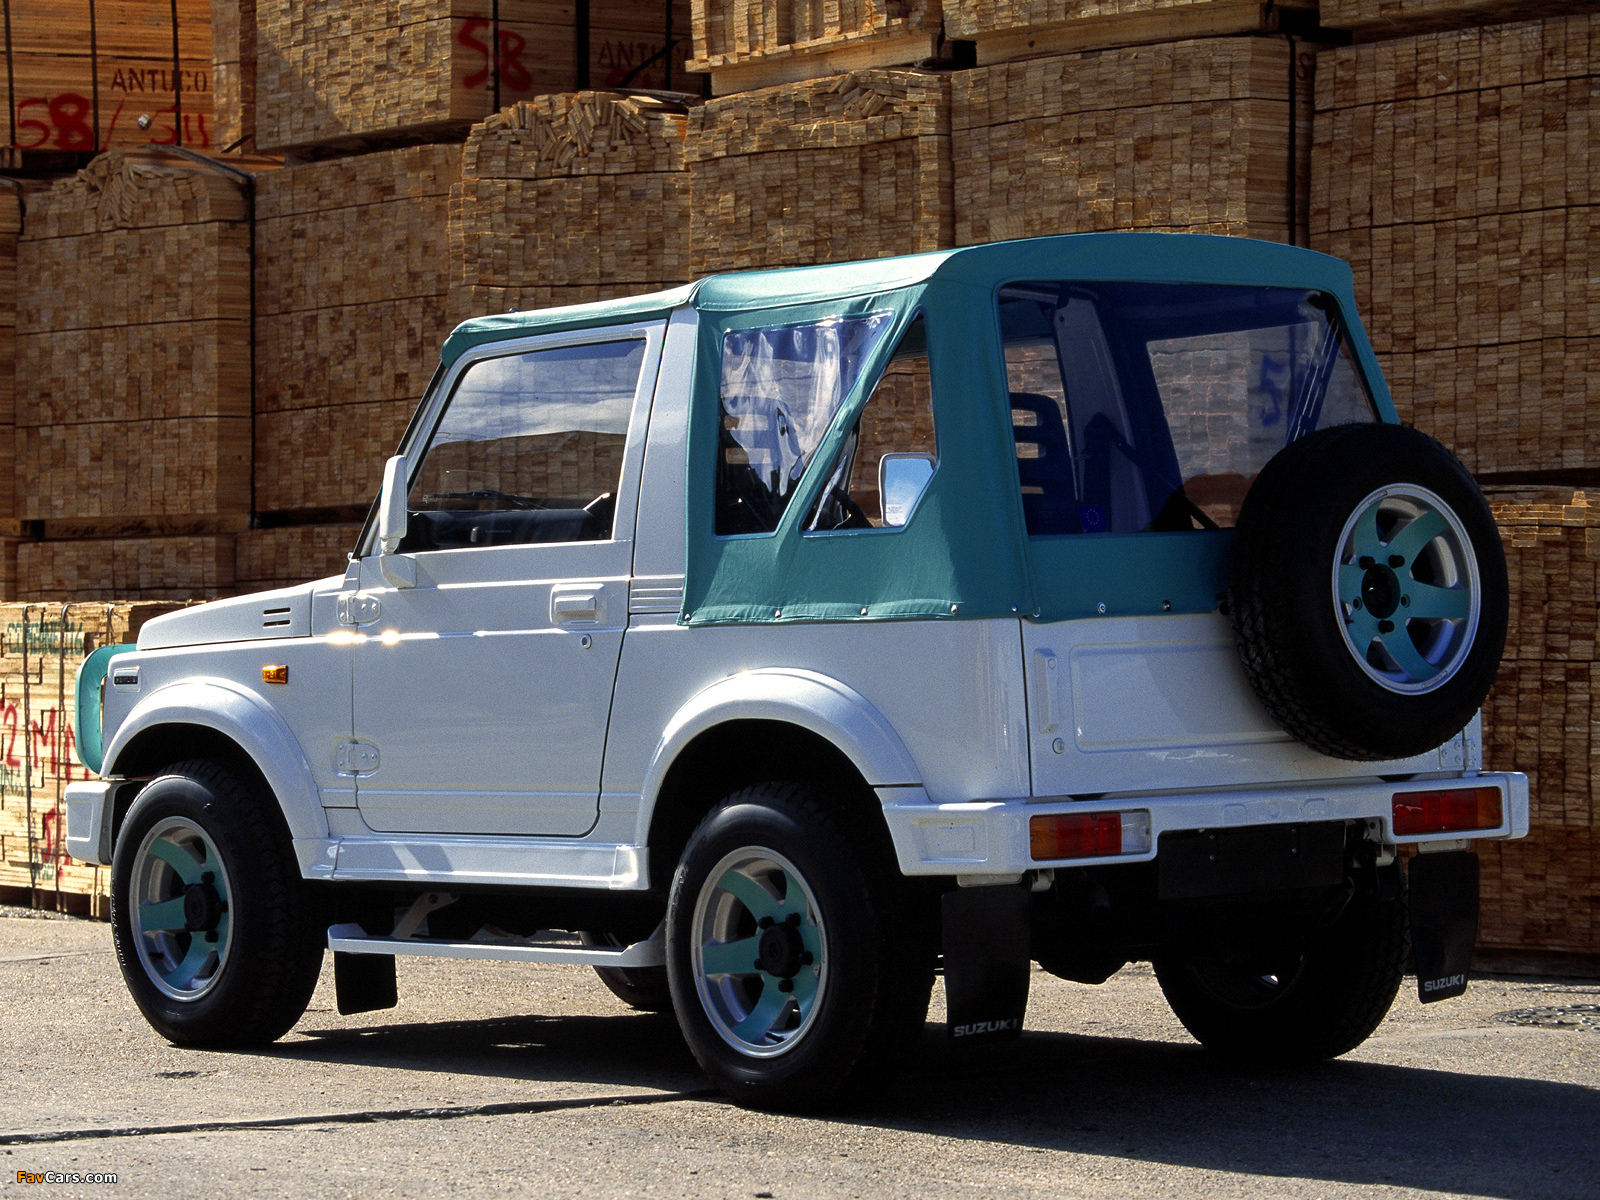 1990 Suzuki Samurai - Information And Photos